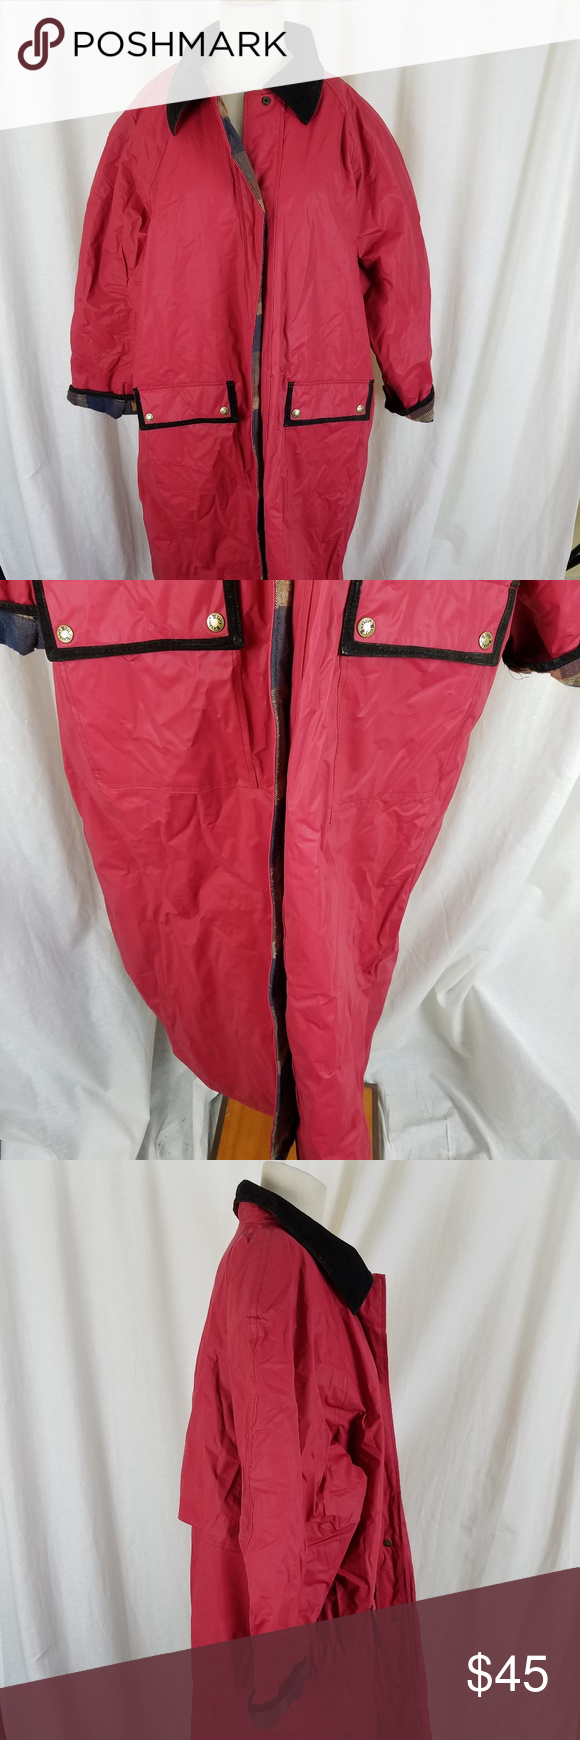 c62c9674cf408 Misty Harbor Flannel Lined PVC Slicker Rain Coat Vintage Misty Harbor long PVC  raincoat Women s size